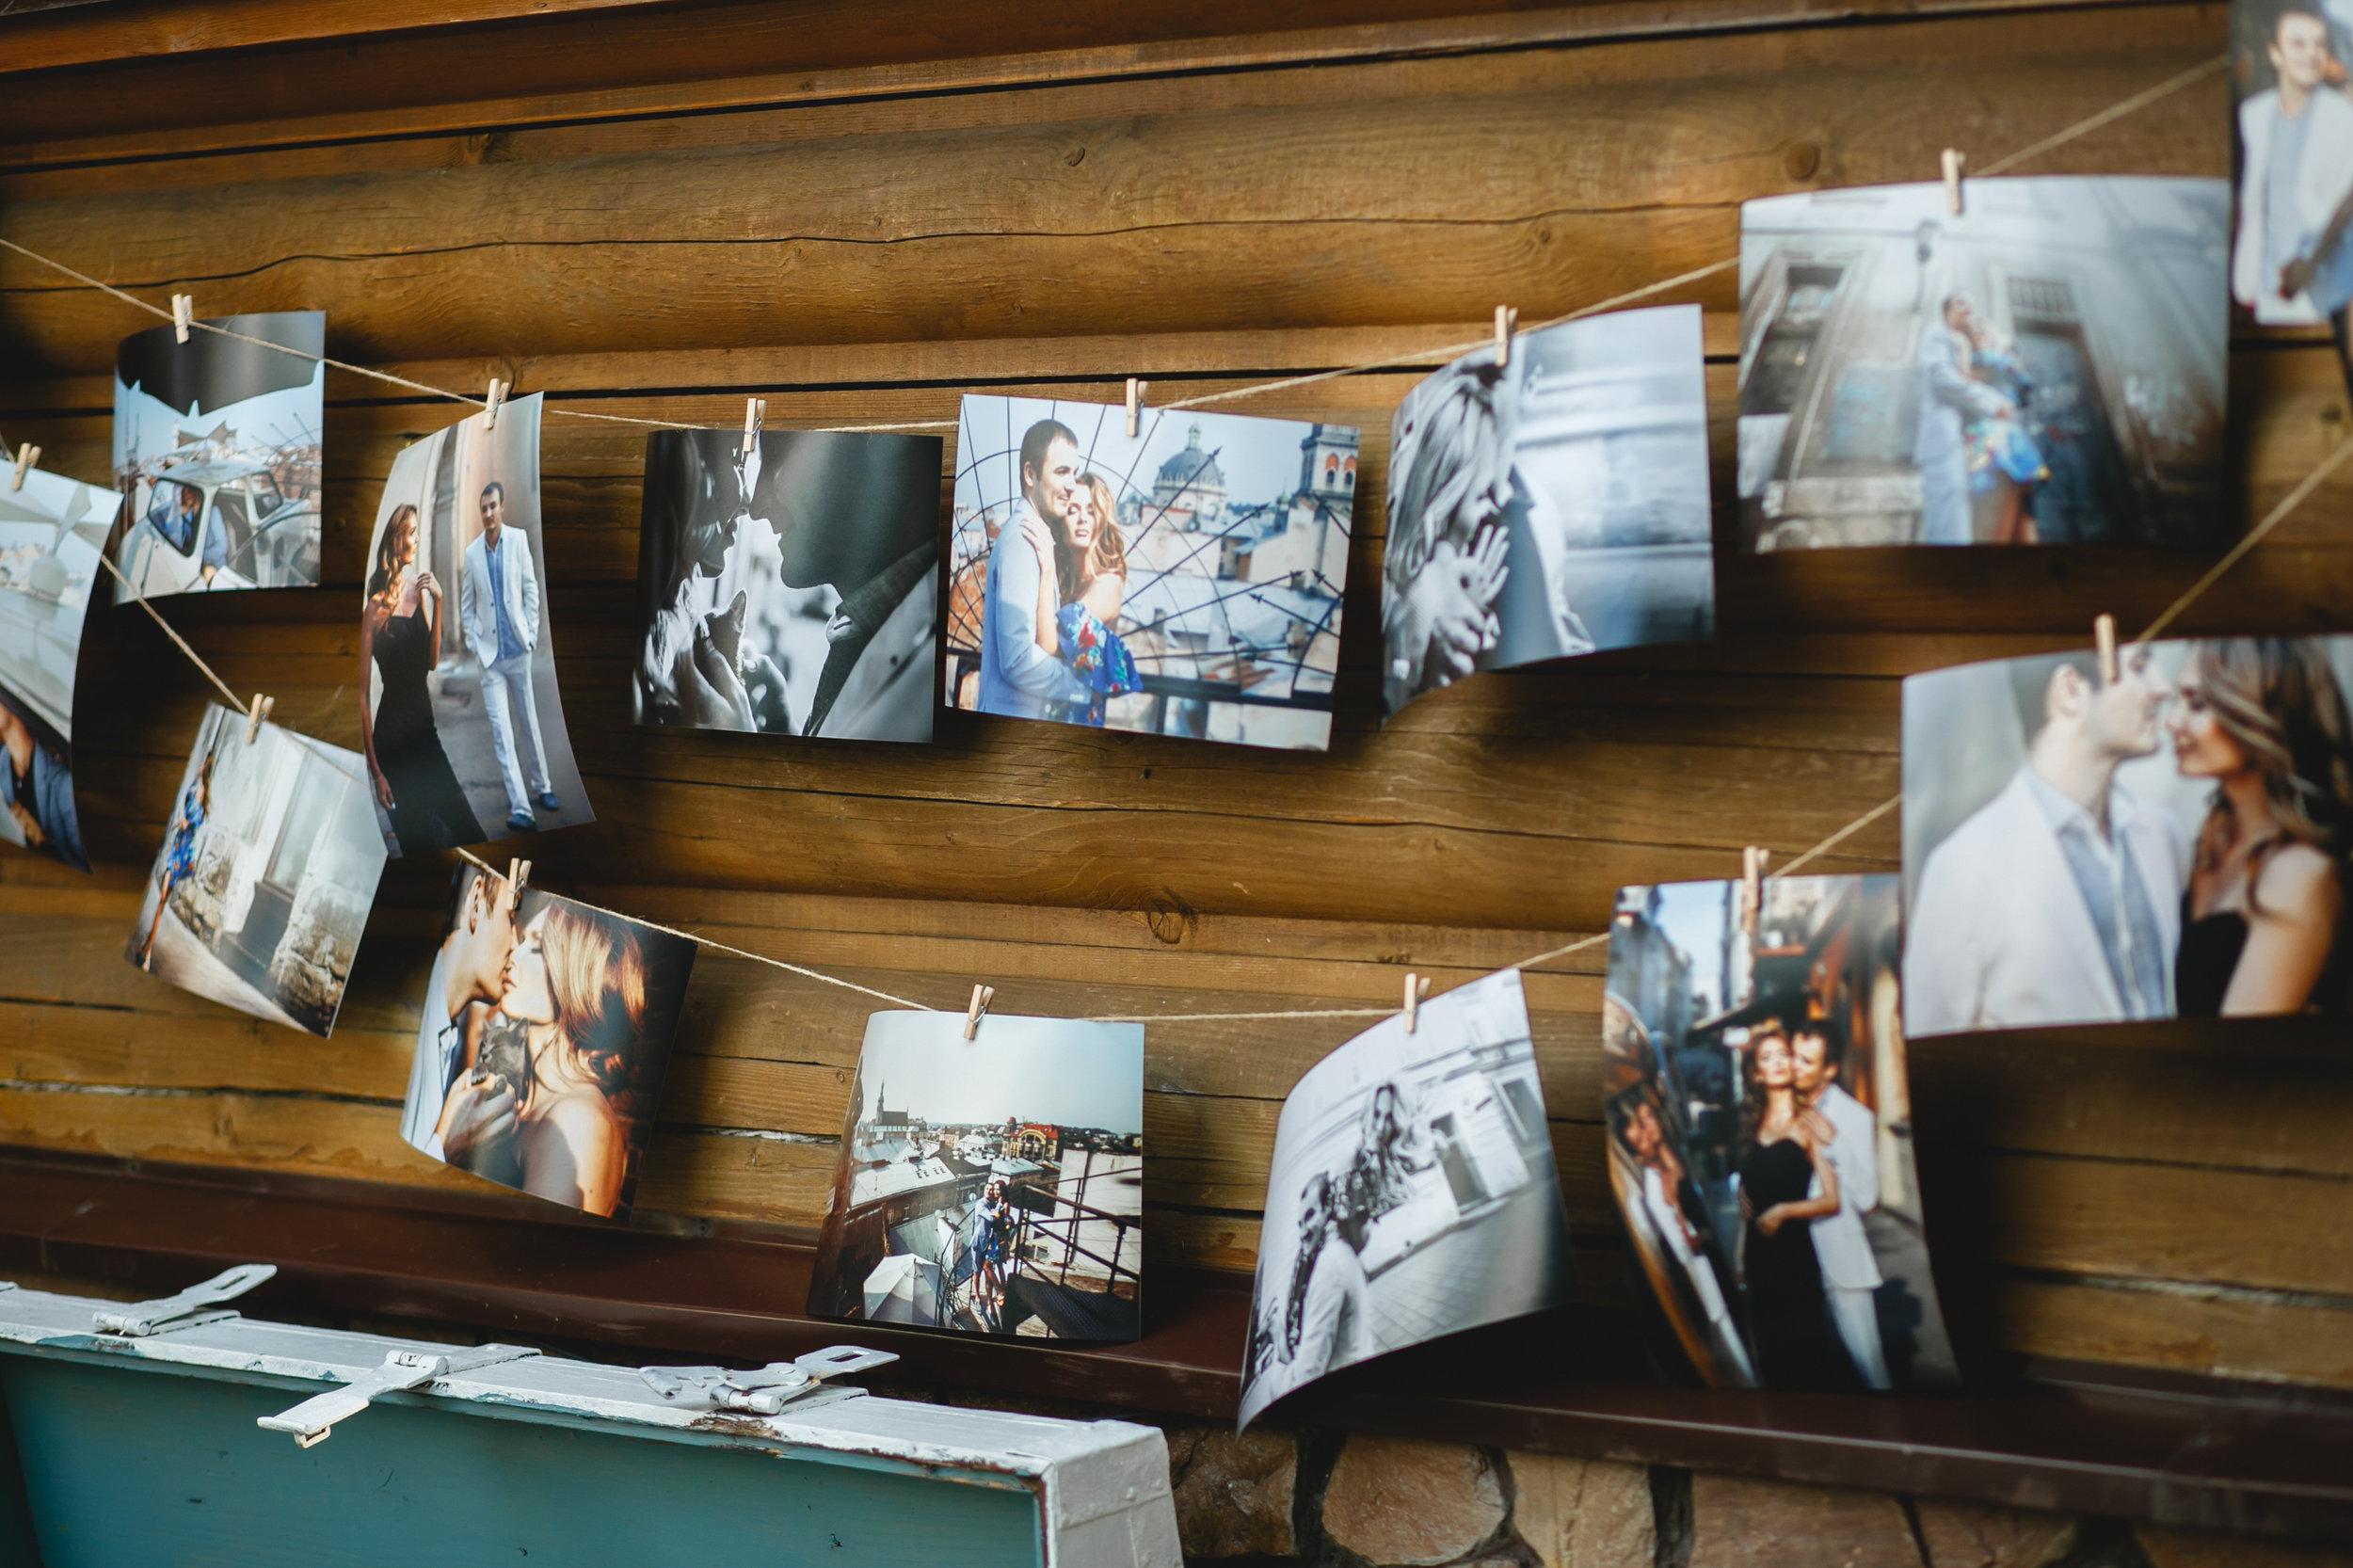 Wedding decor idea using photo prints